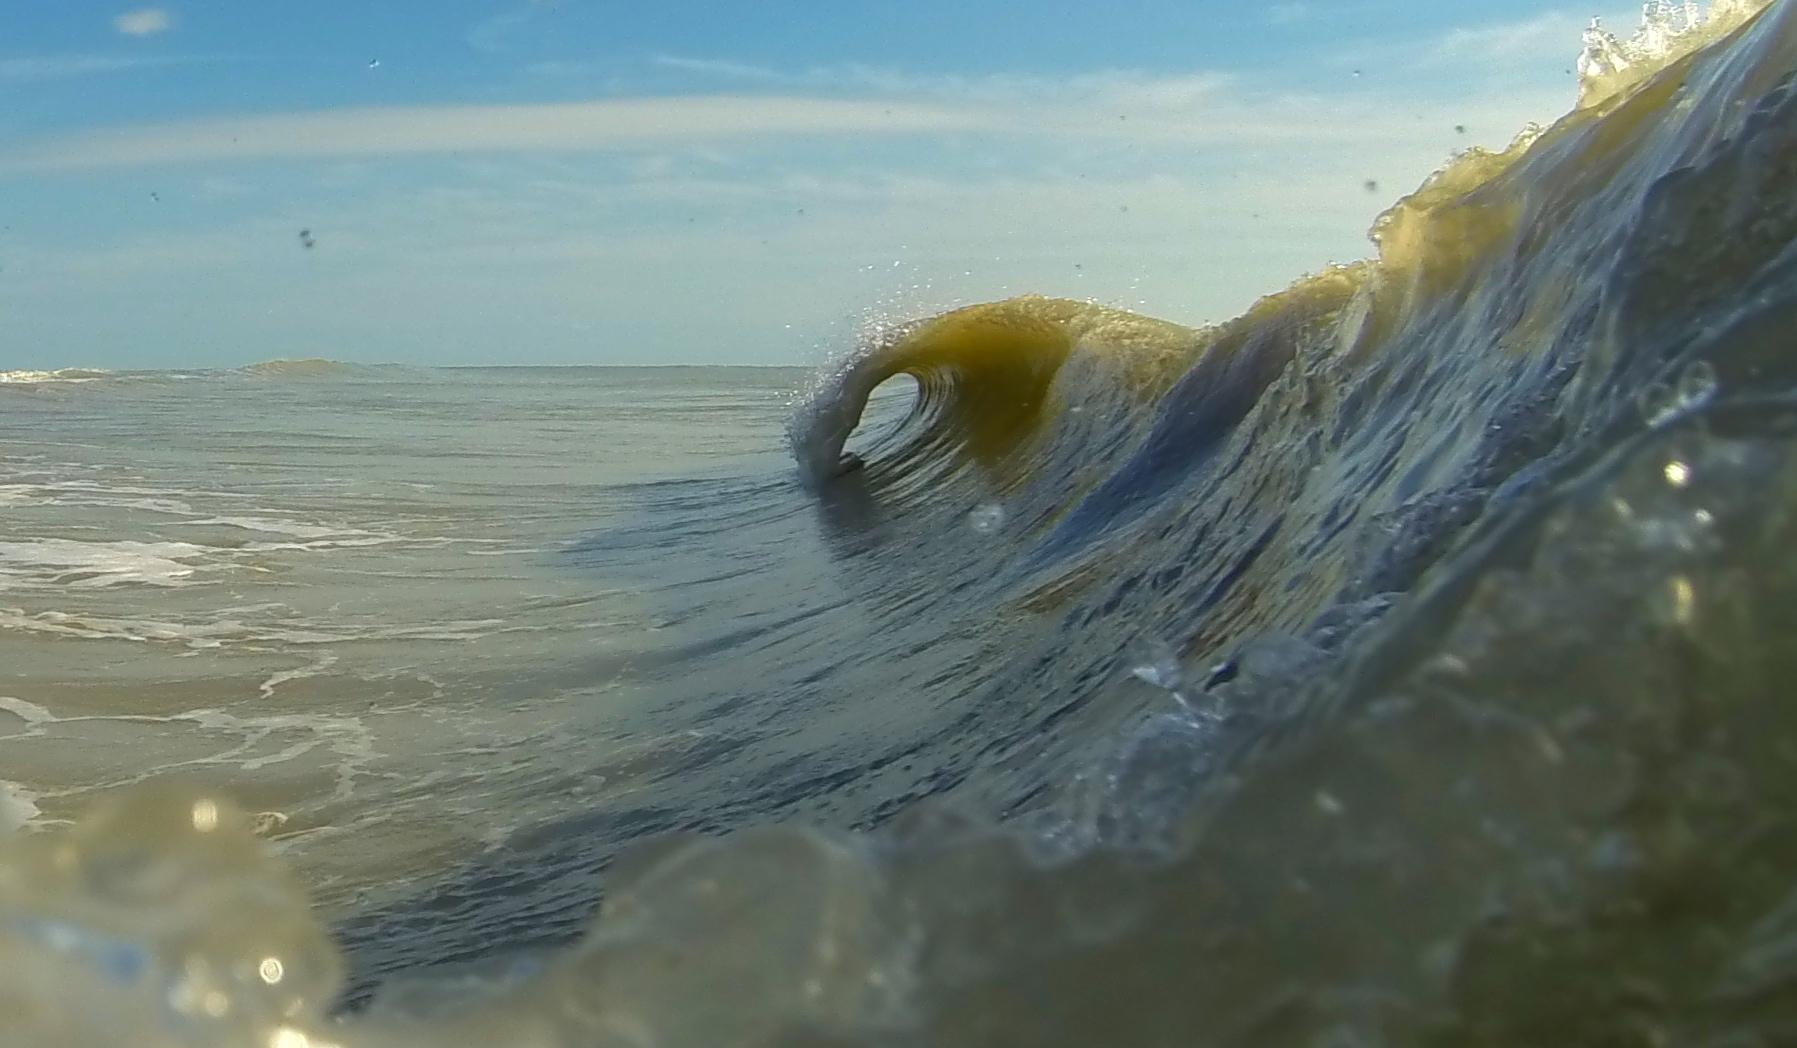 Sanibel Island swell - photo by Dave Decker